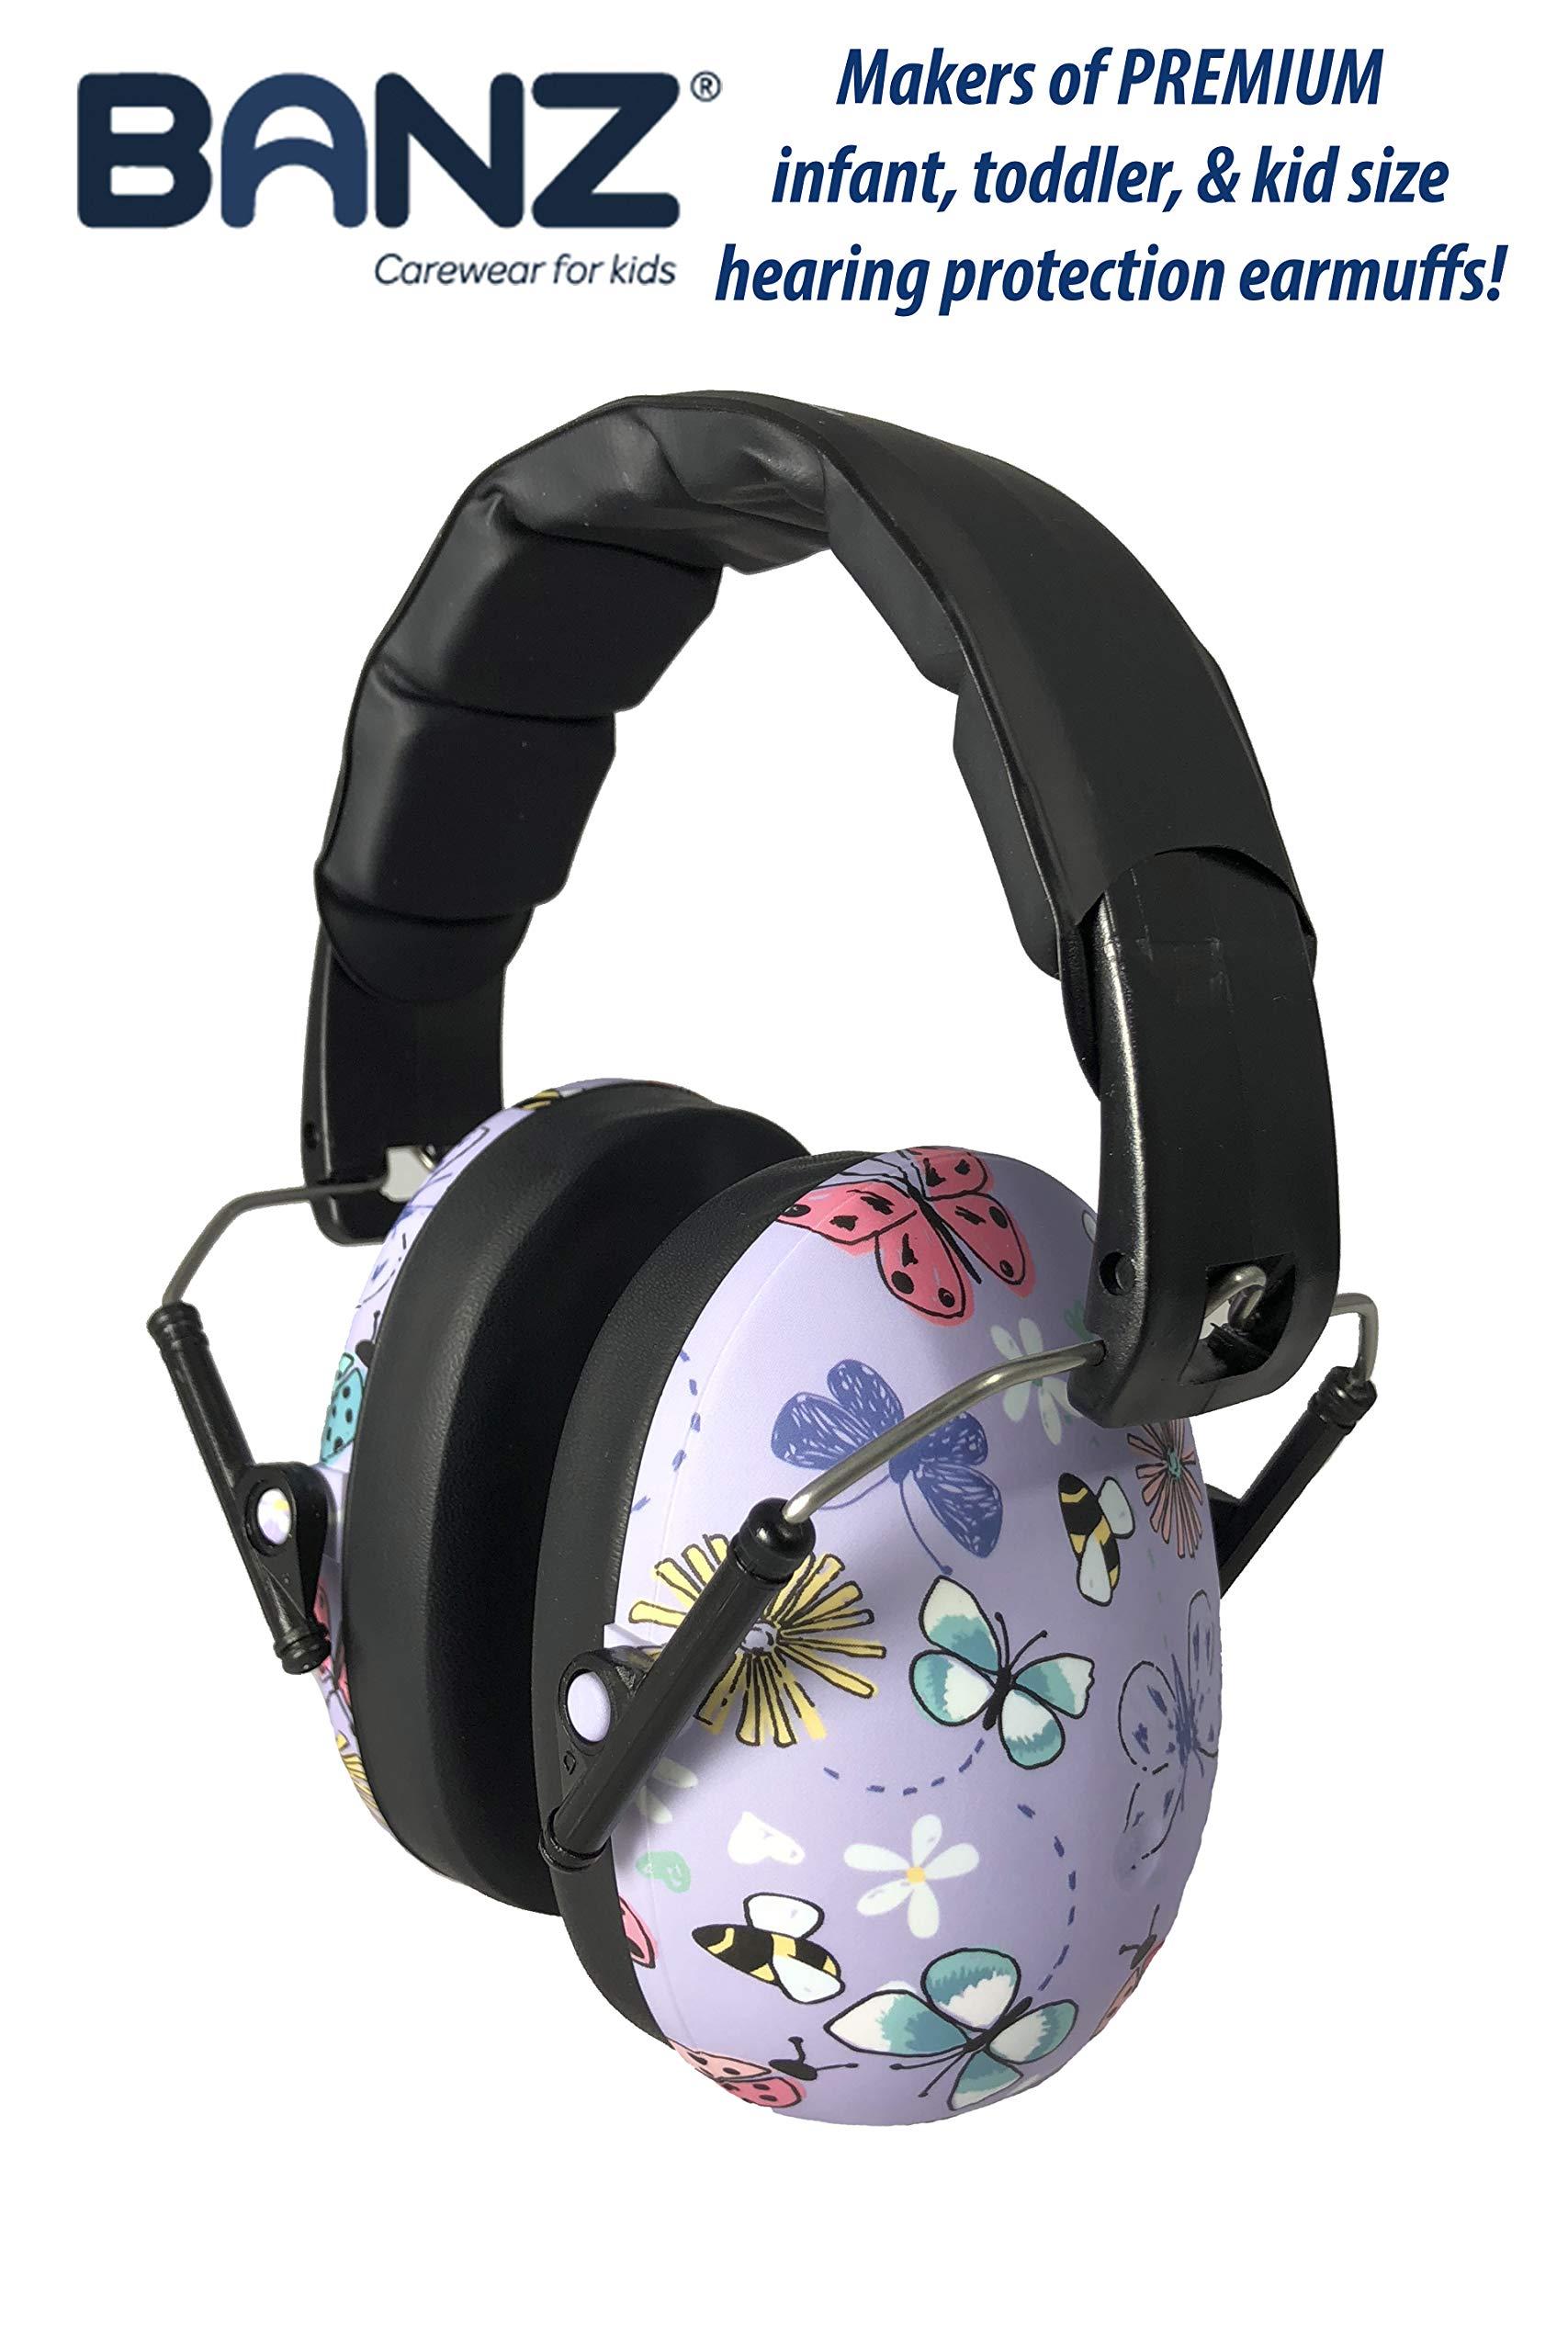 Amazon.com : Banz Earmuffs Hearing Protection - The Best